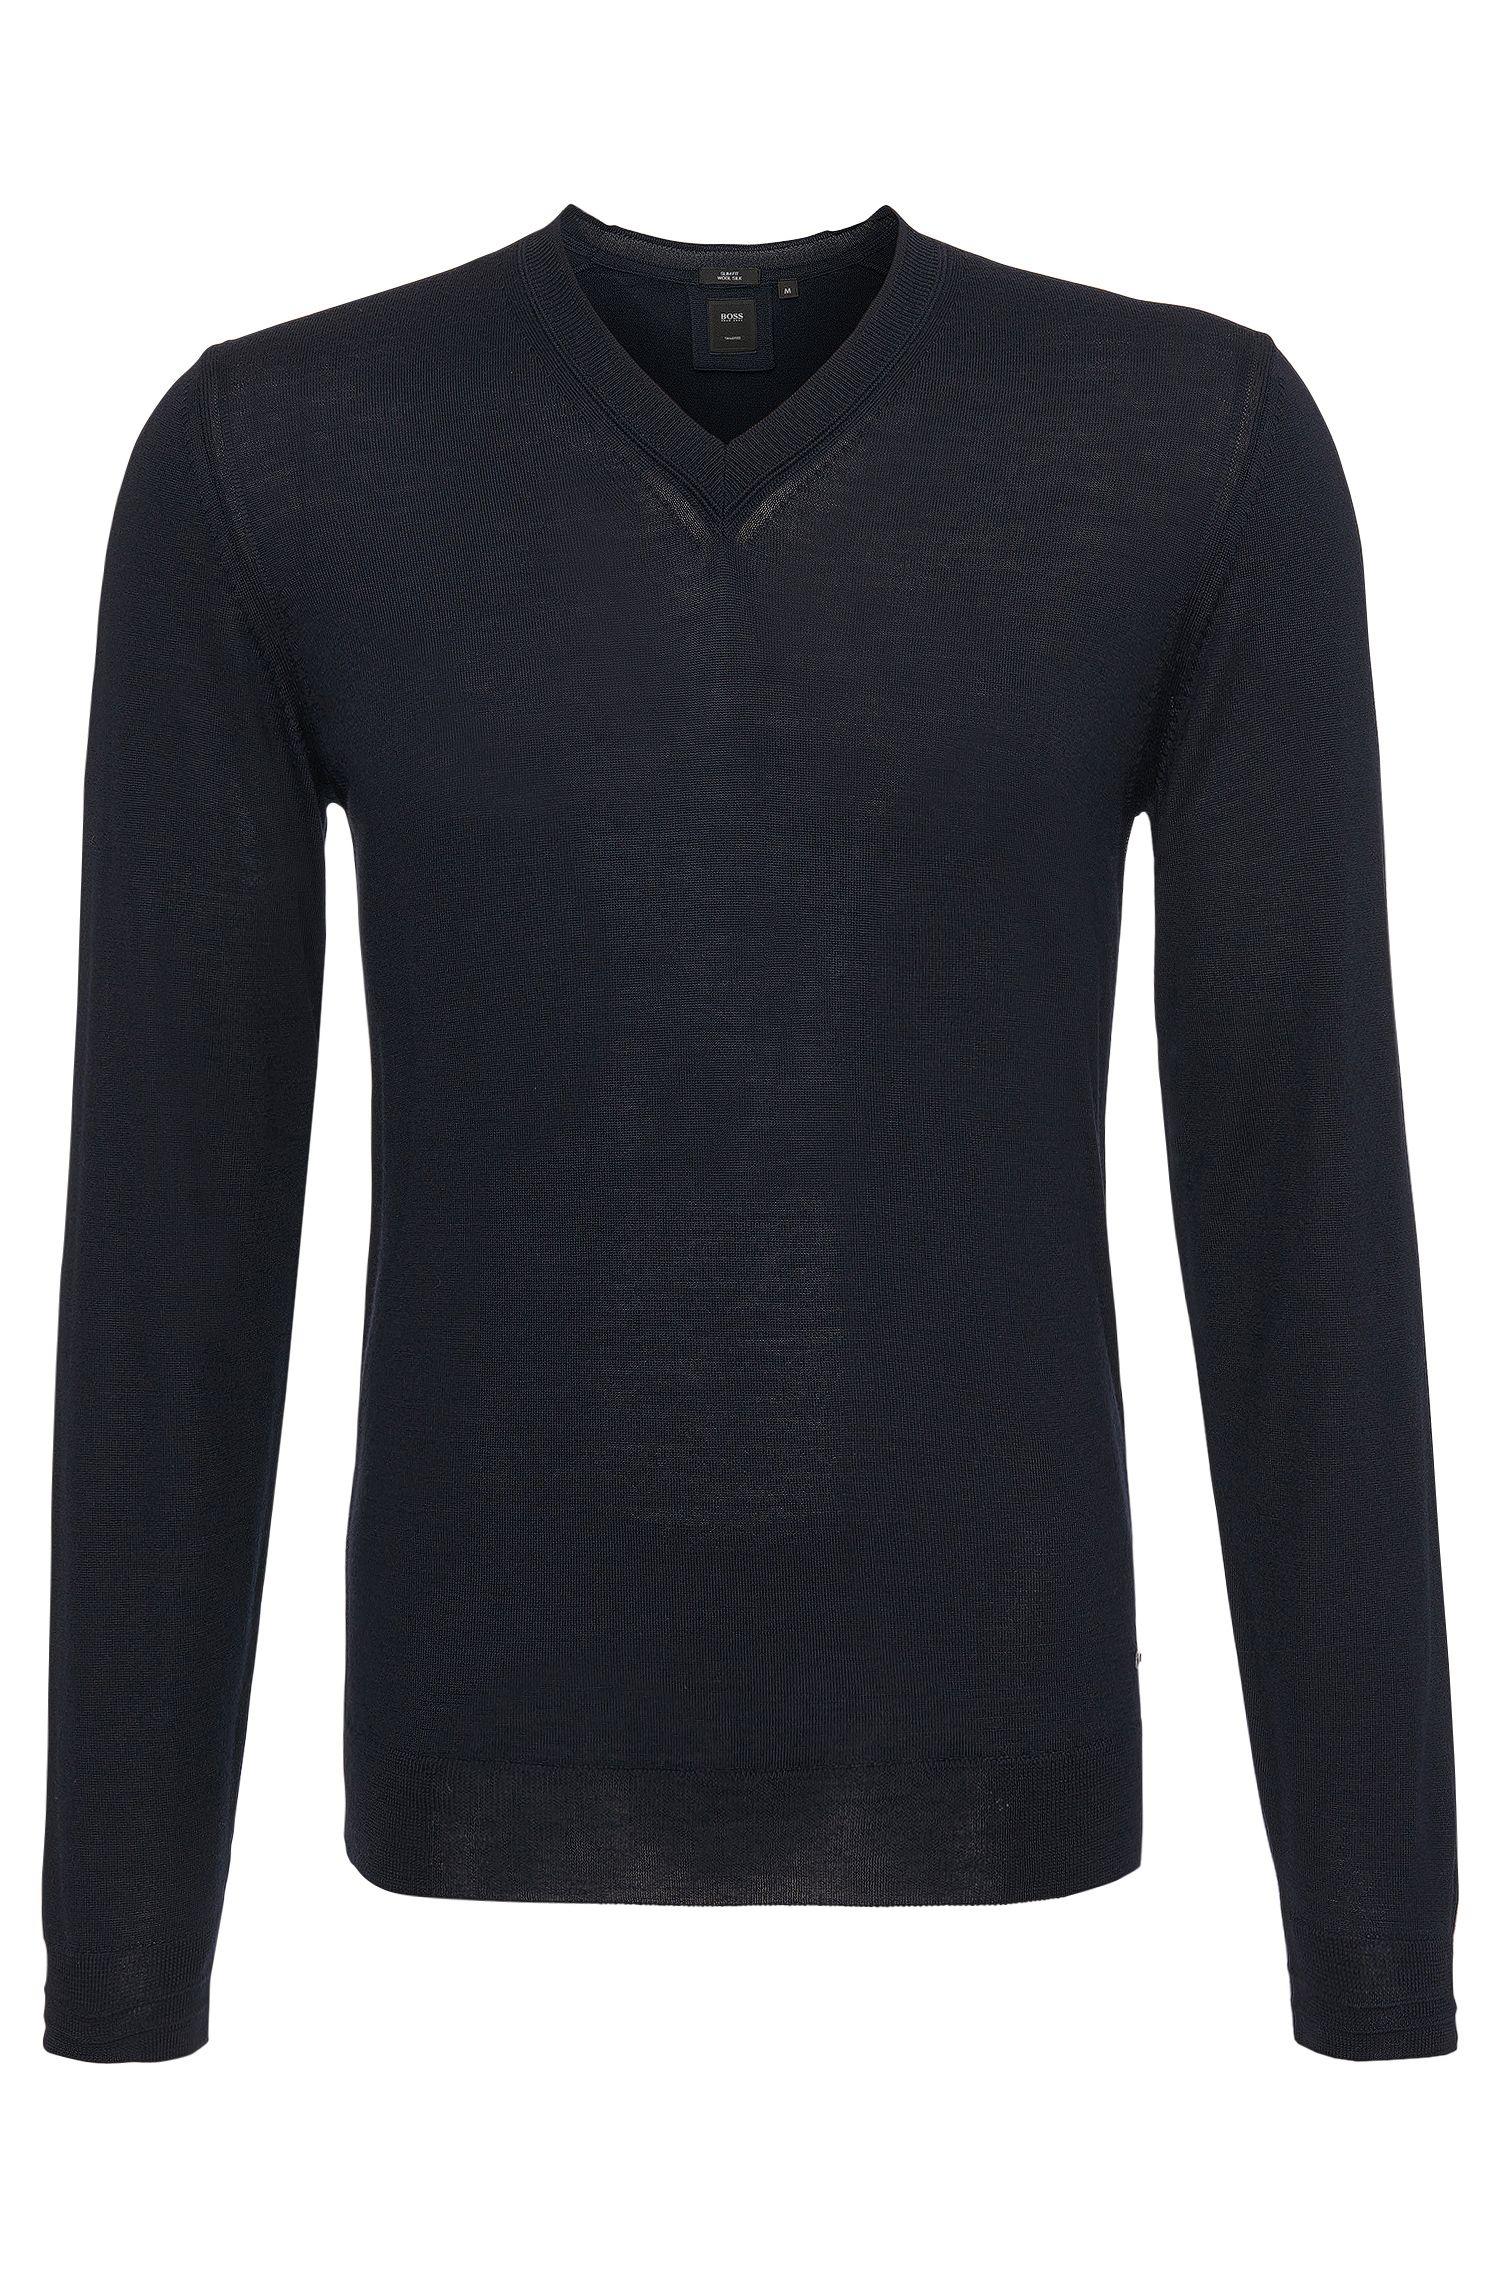 Pullover in maglia a trama fine Slim-Fit in lana vergine con percentuale di seta: 'T-Dan'